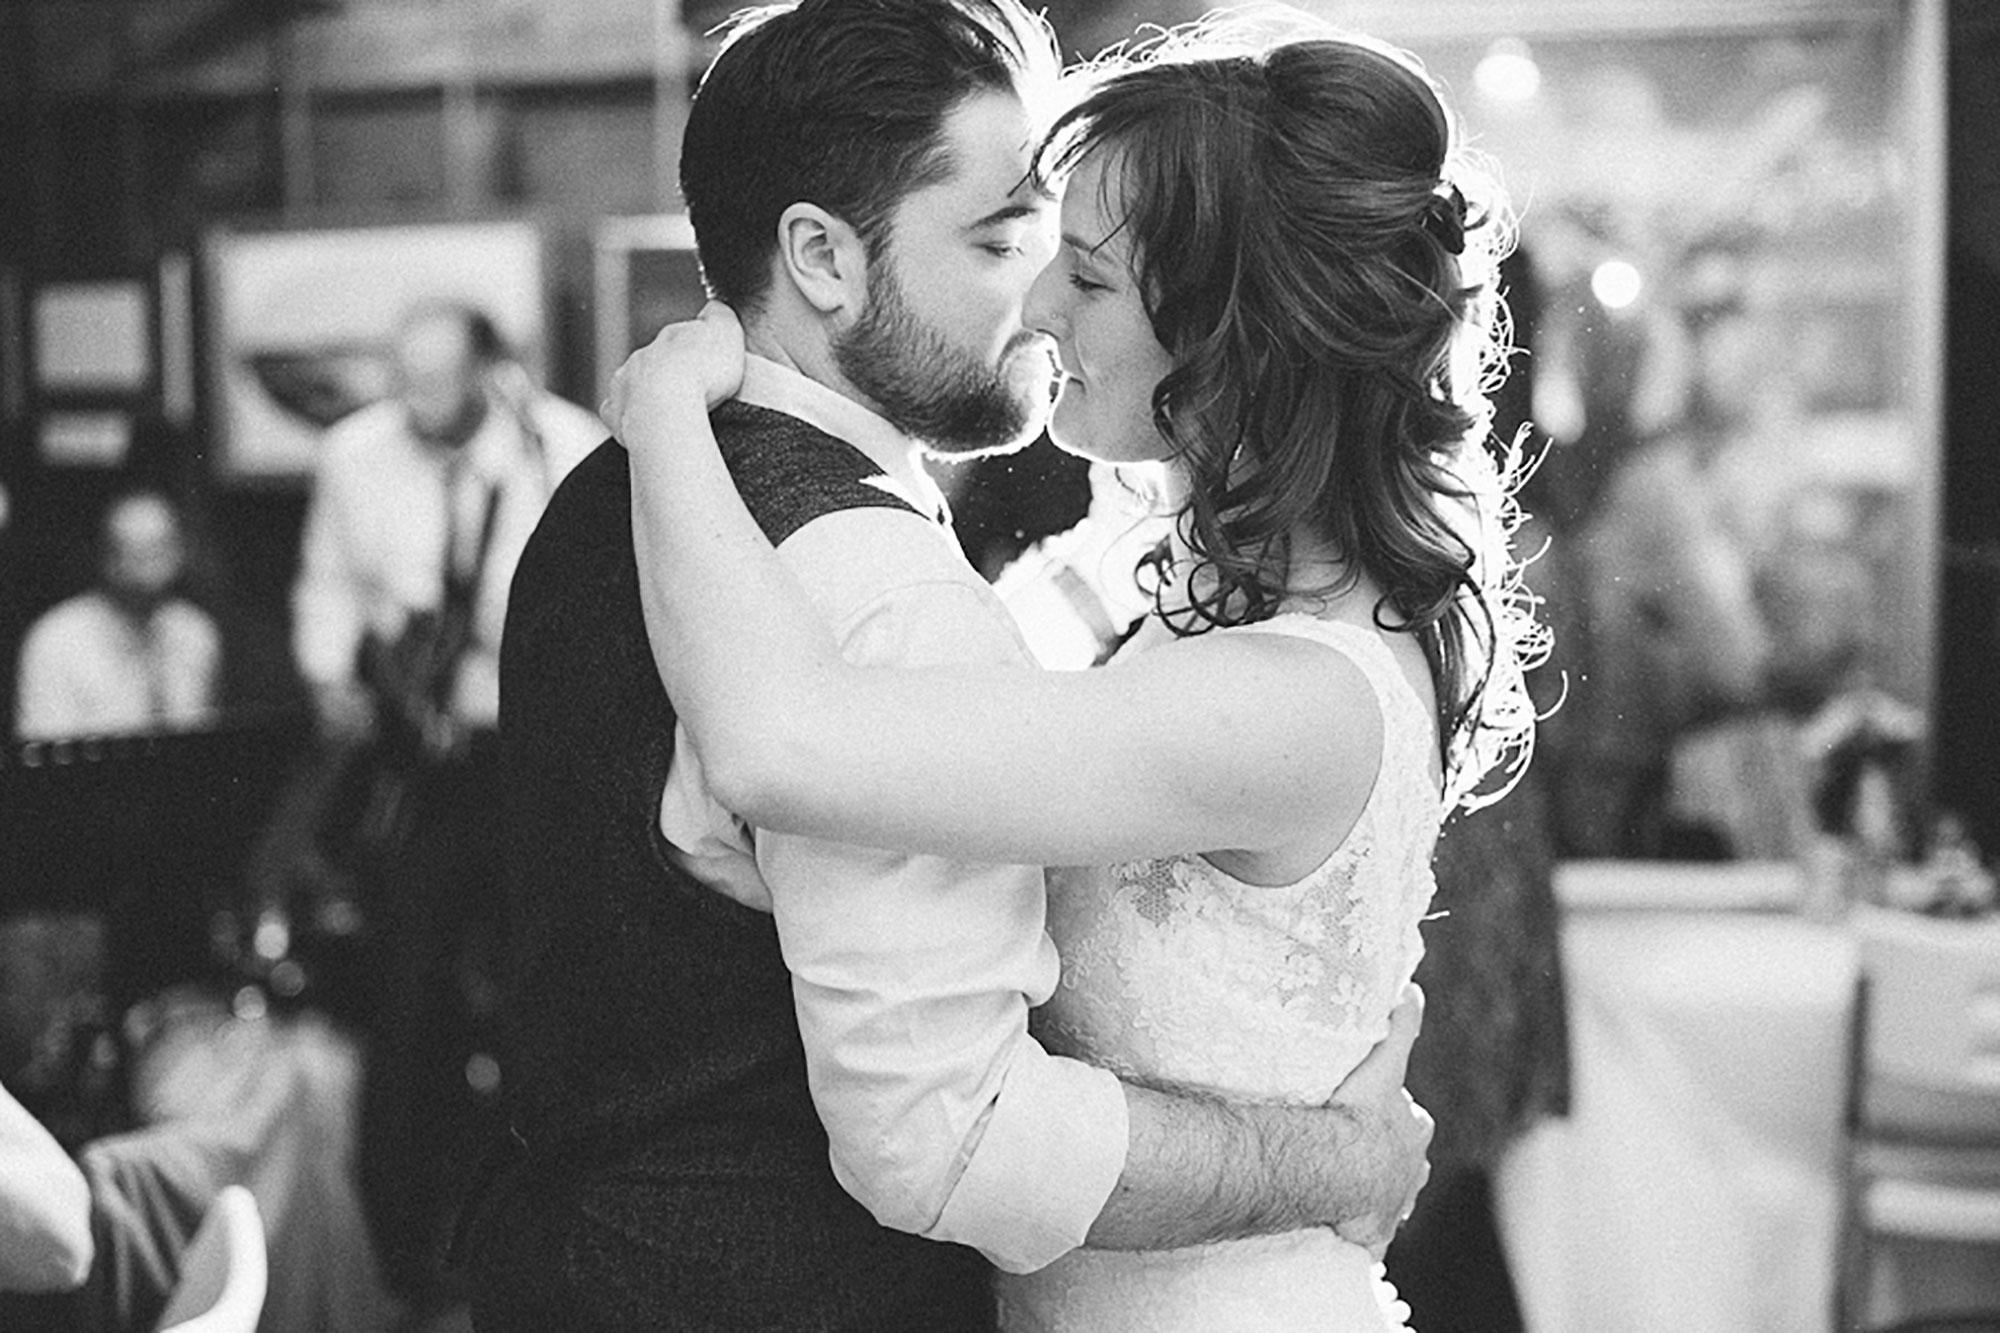 Navy-Hall-Wedding-Vineyard-Bride-Photo-By-Andrew-Mark-Photography-054.jpg